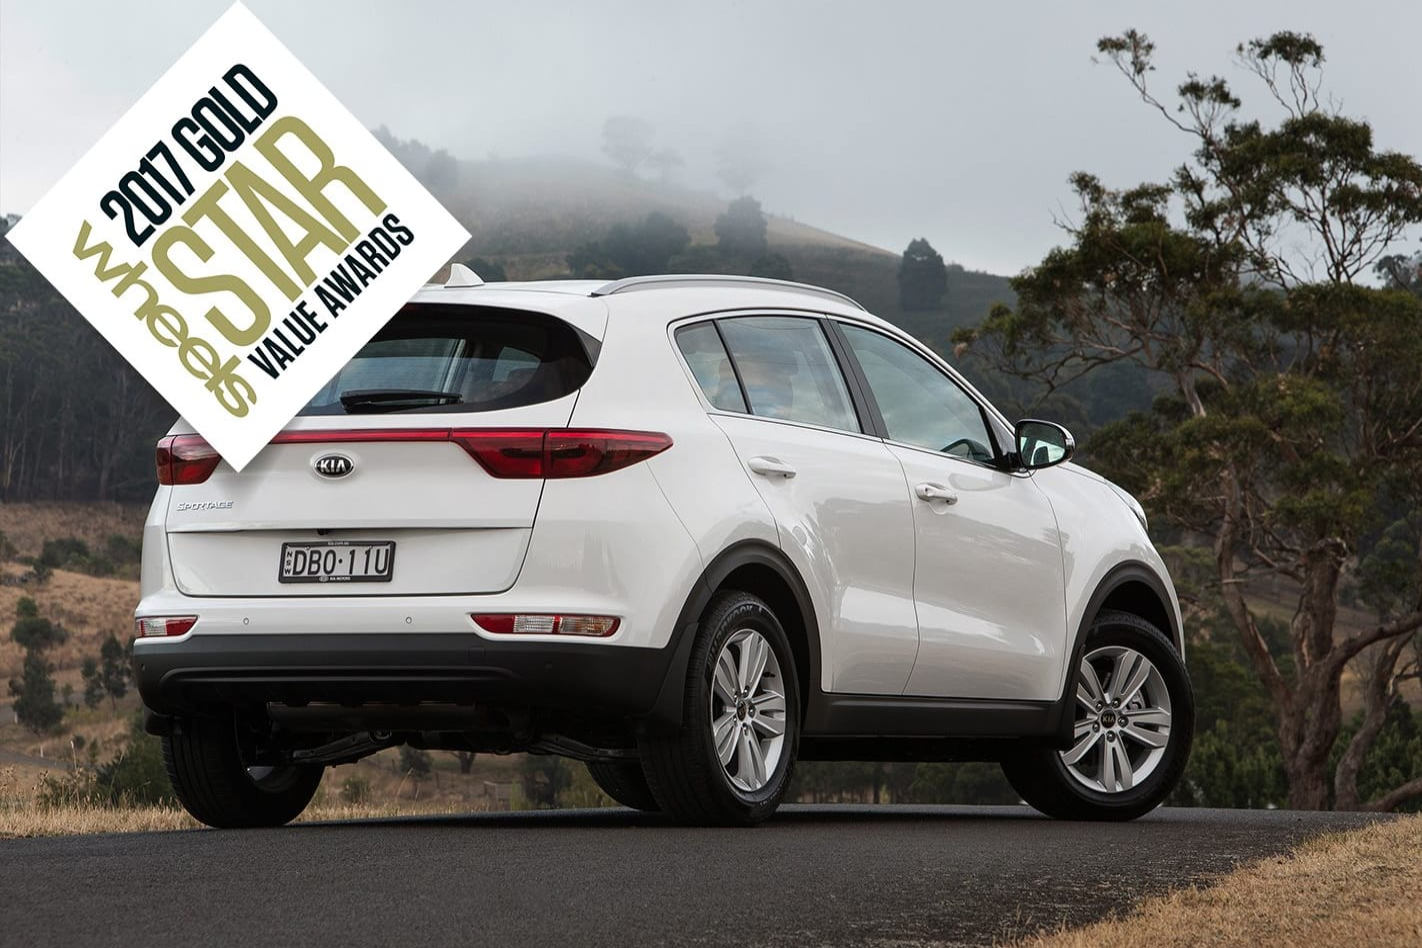 Medium SUVs under 45K: Australia's Best Value Cars 2017